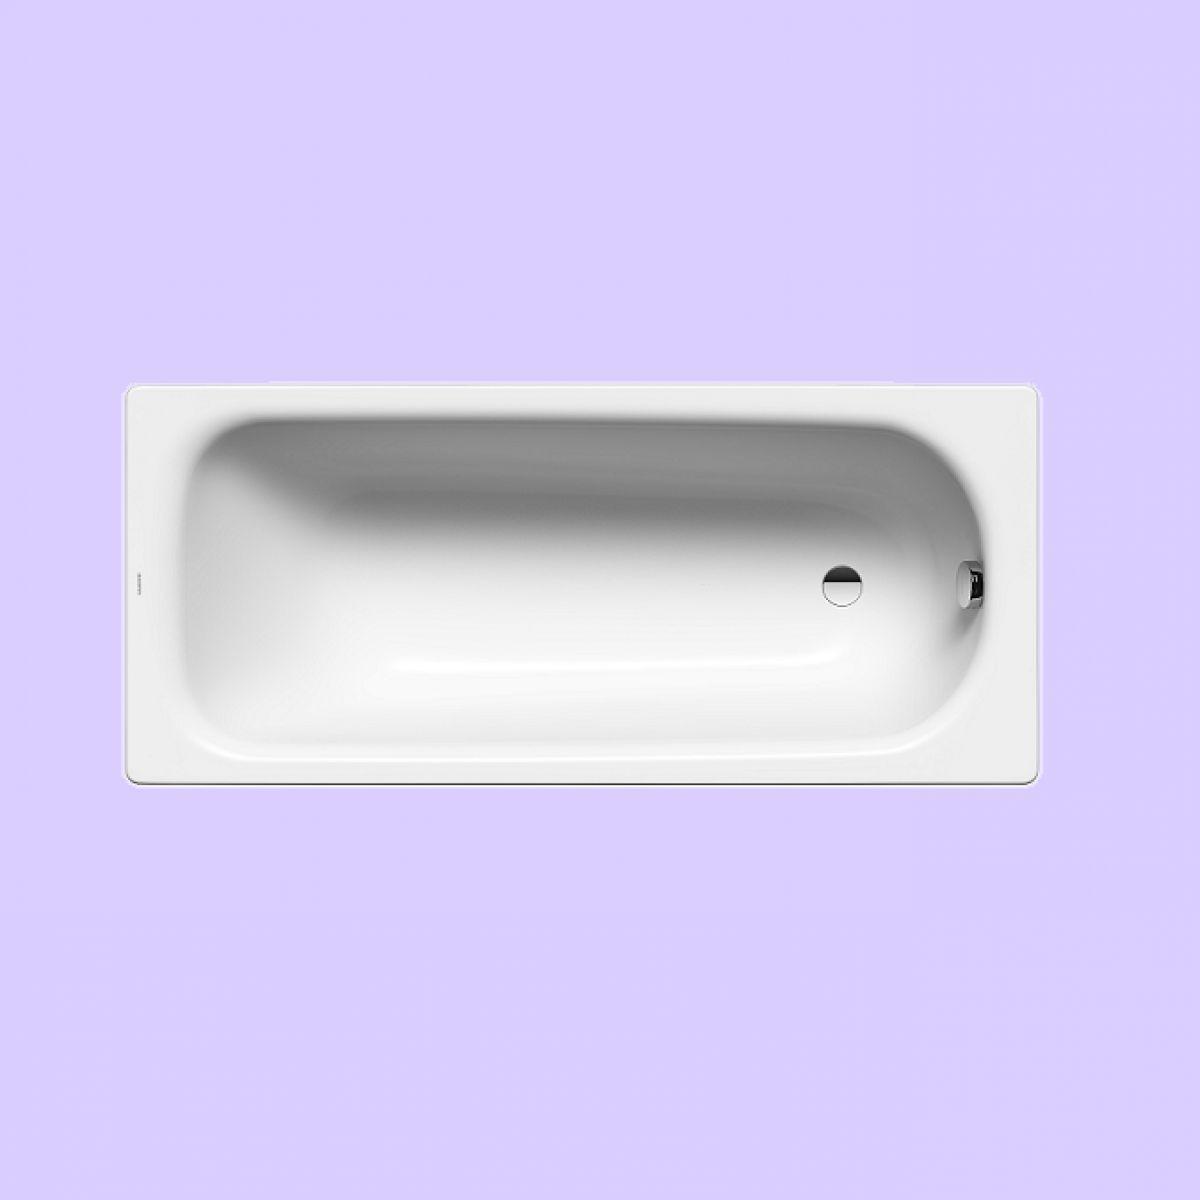 kaldewei saniform plus steel bath uk bathrooms. Black Bedroom Furniture Sets. Home Design Ideas